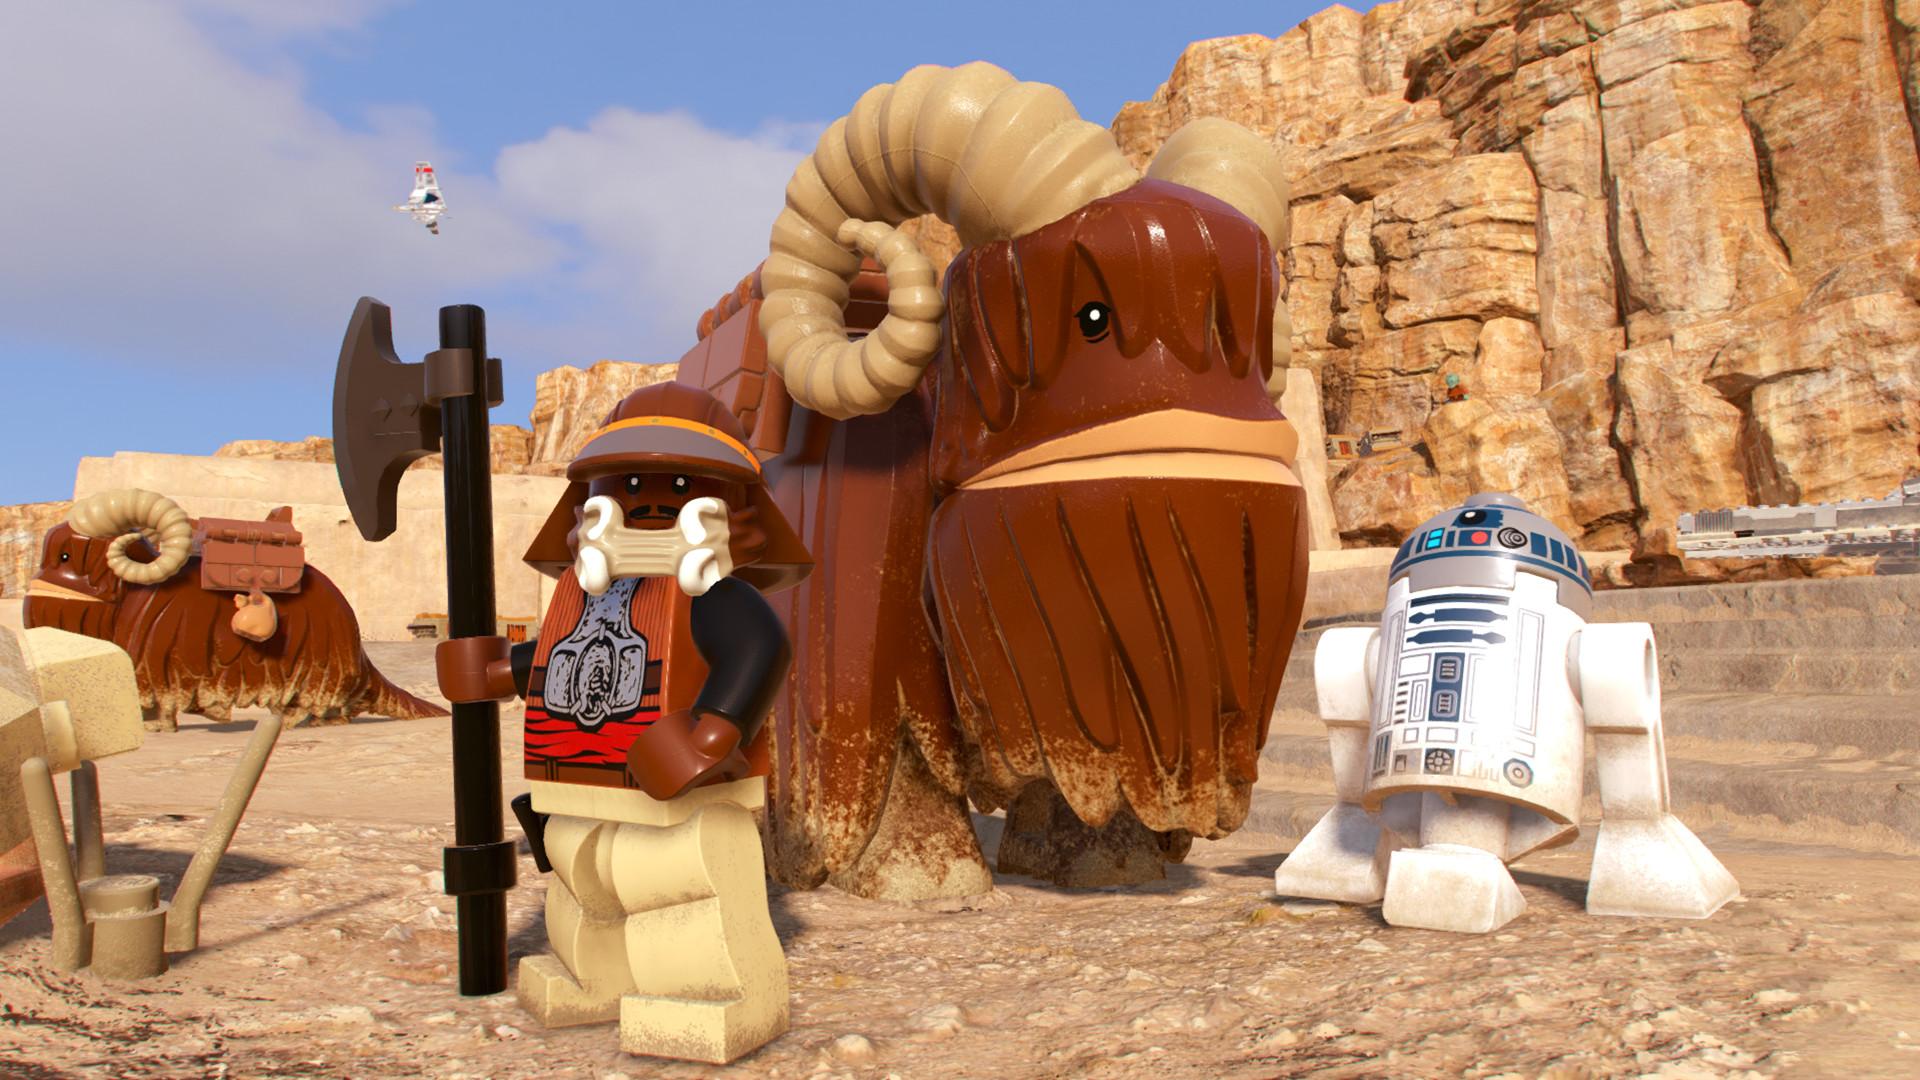 Lego Star Wars The Skywalker Saga Is Coming In Spring 2021 Pc Gamer